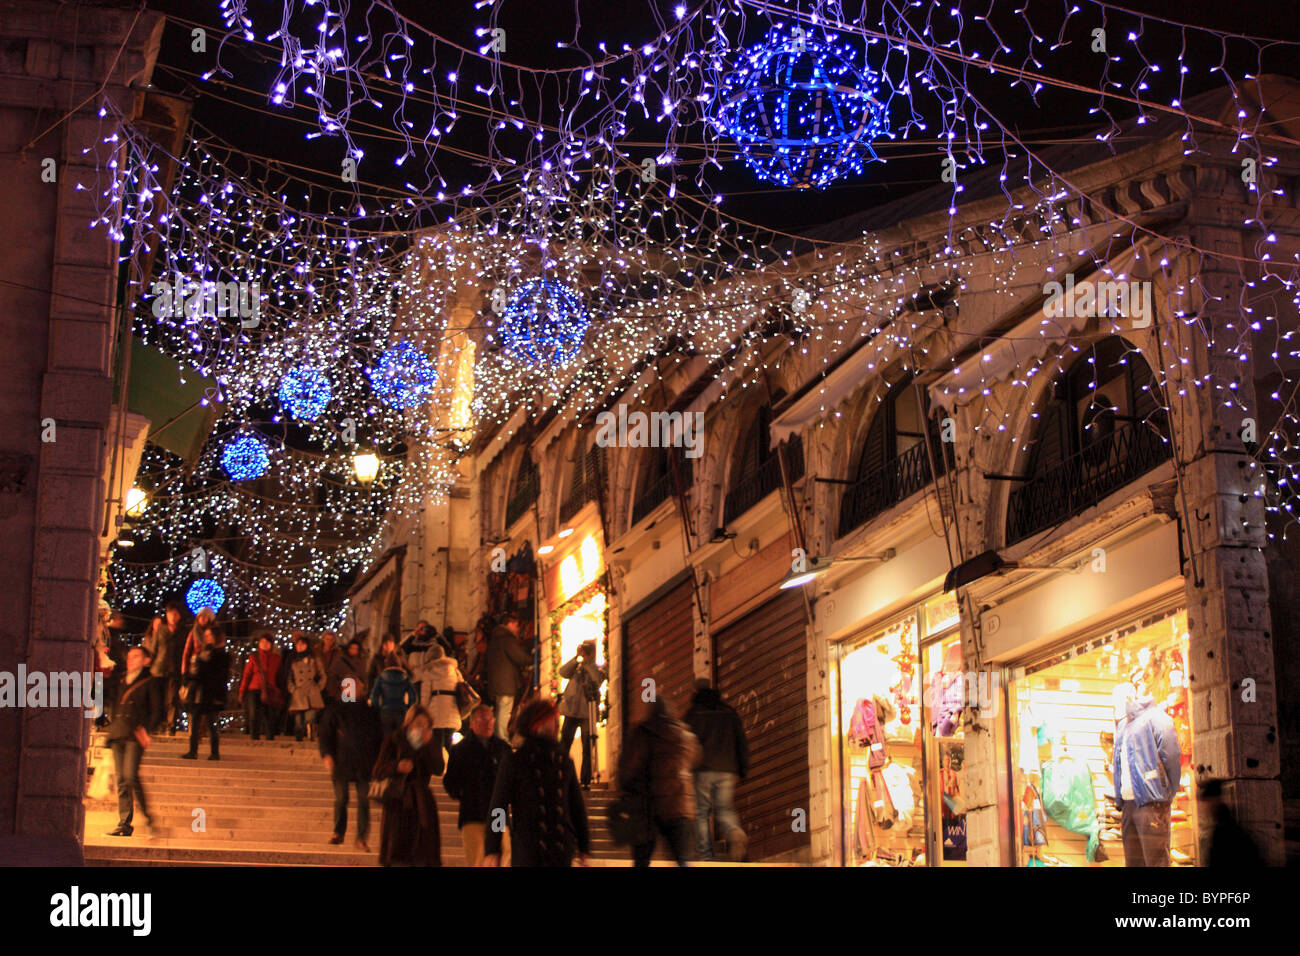 Venice At Christmas 2021 Christmas Lights At Rialto Bridge In Venice Italy Stock Photo Alamy